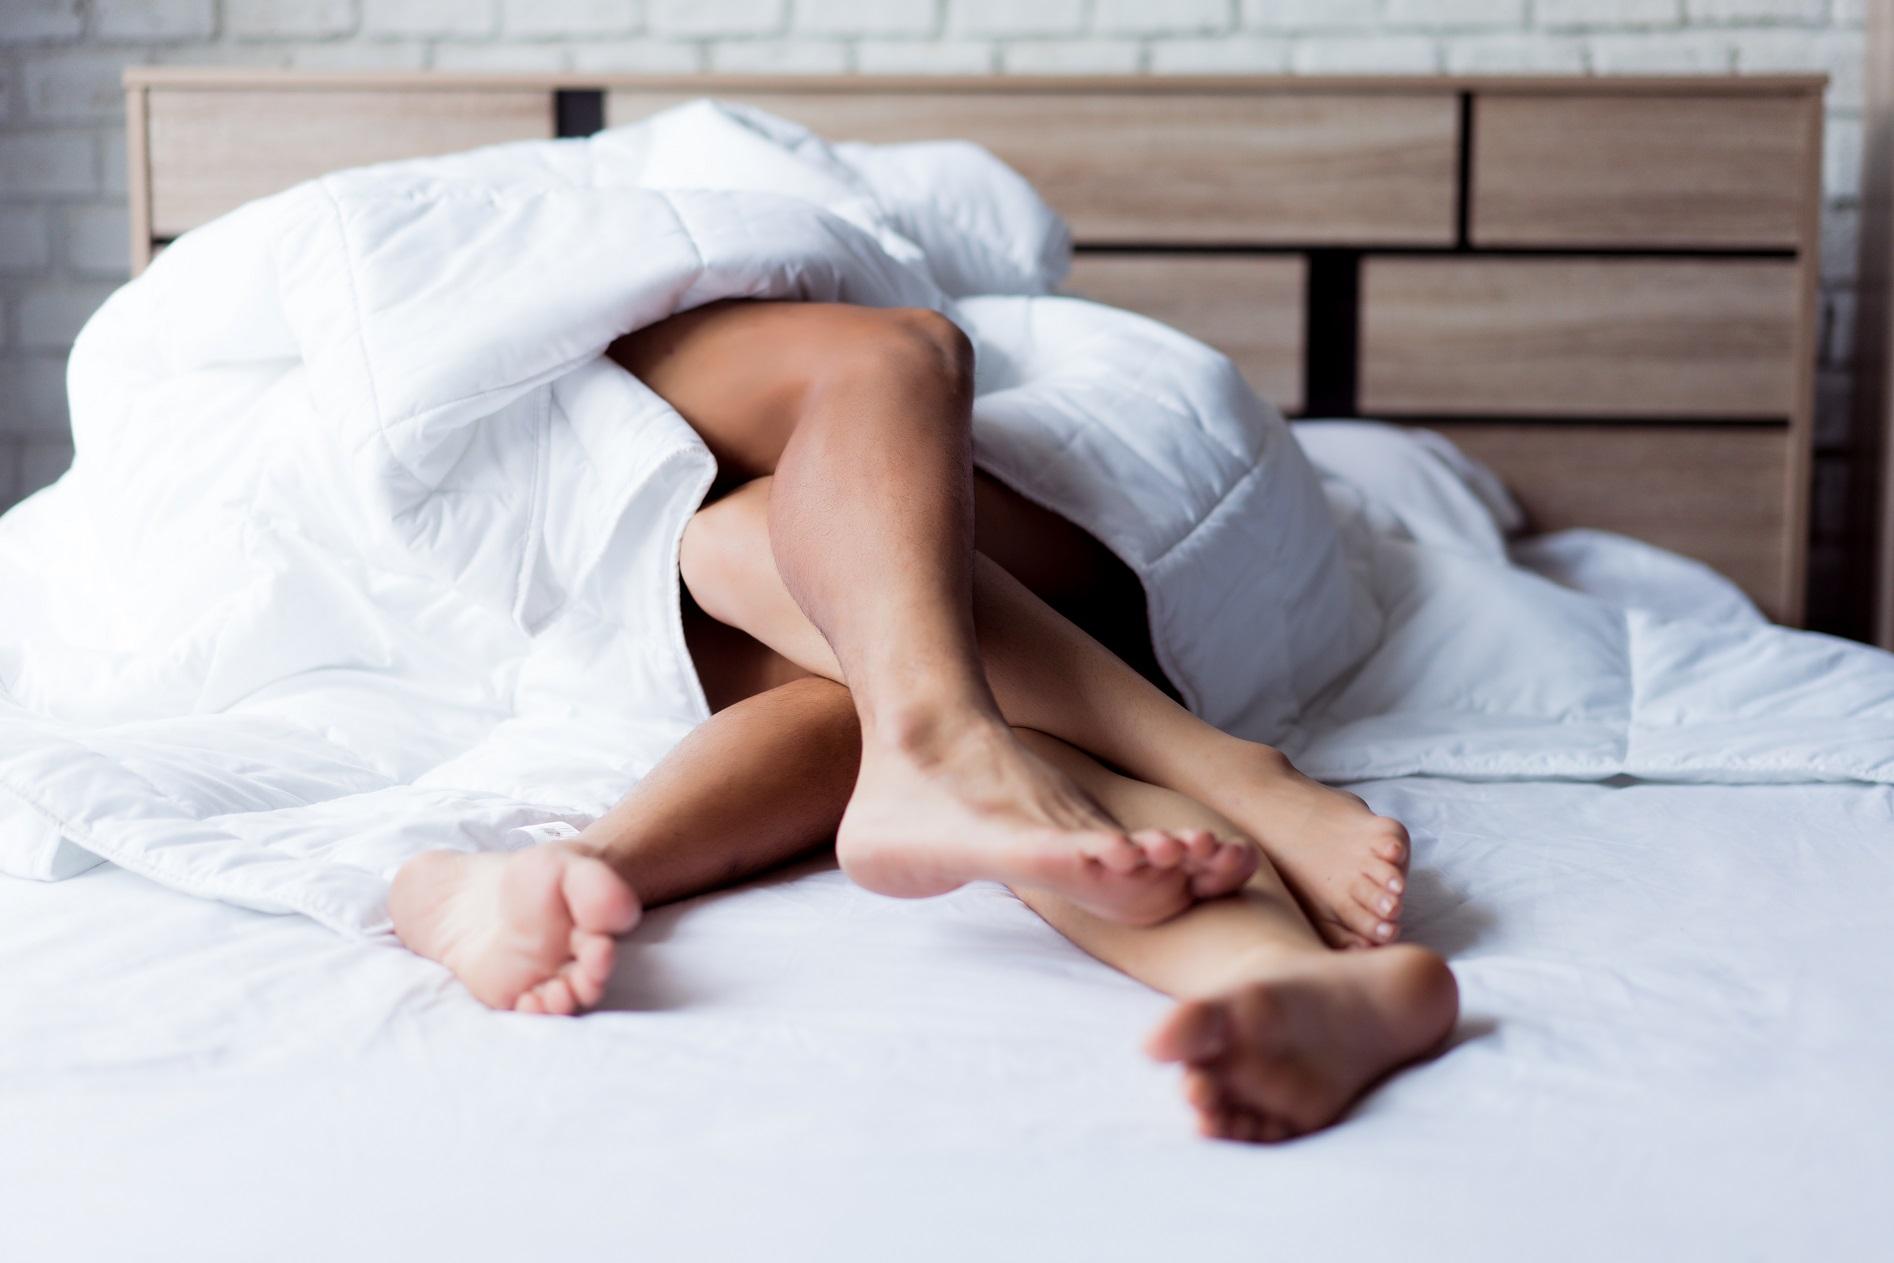 Seksualiteit en zwangerschap